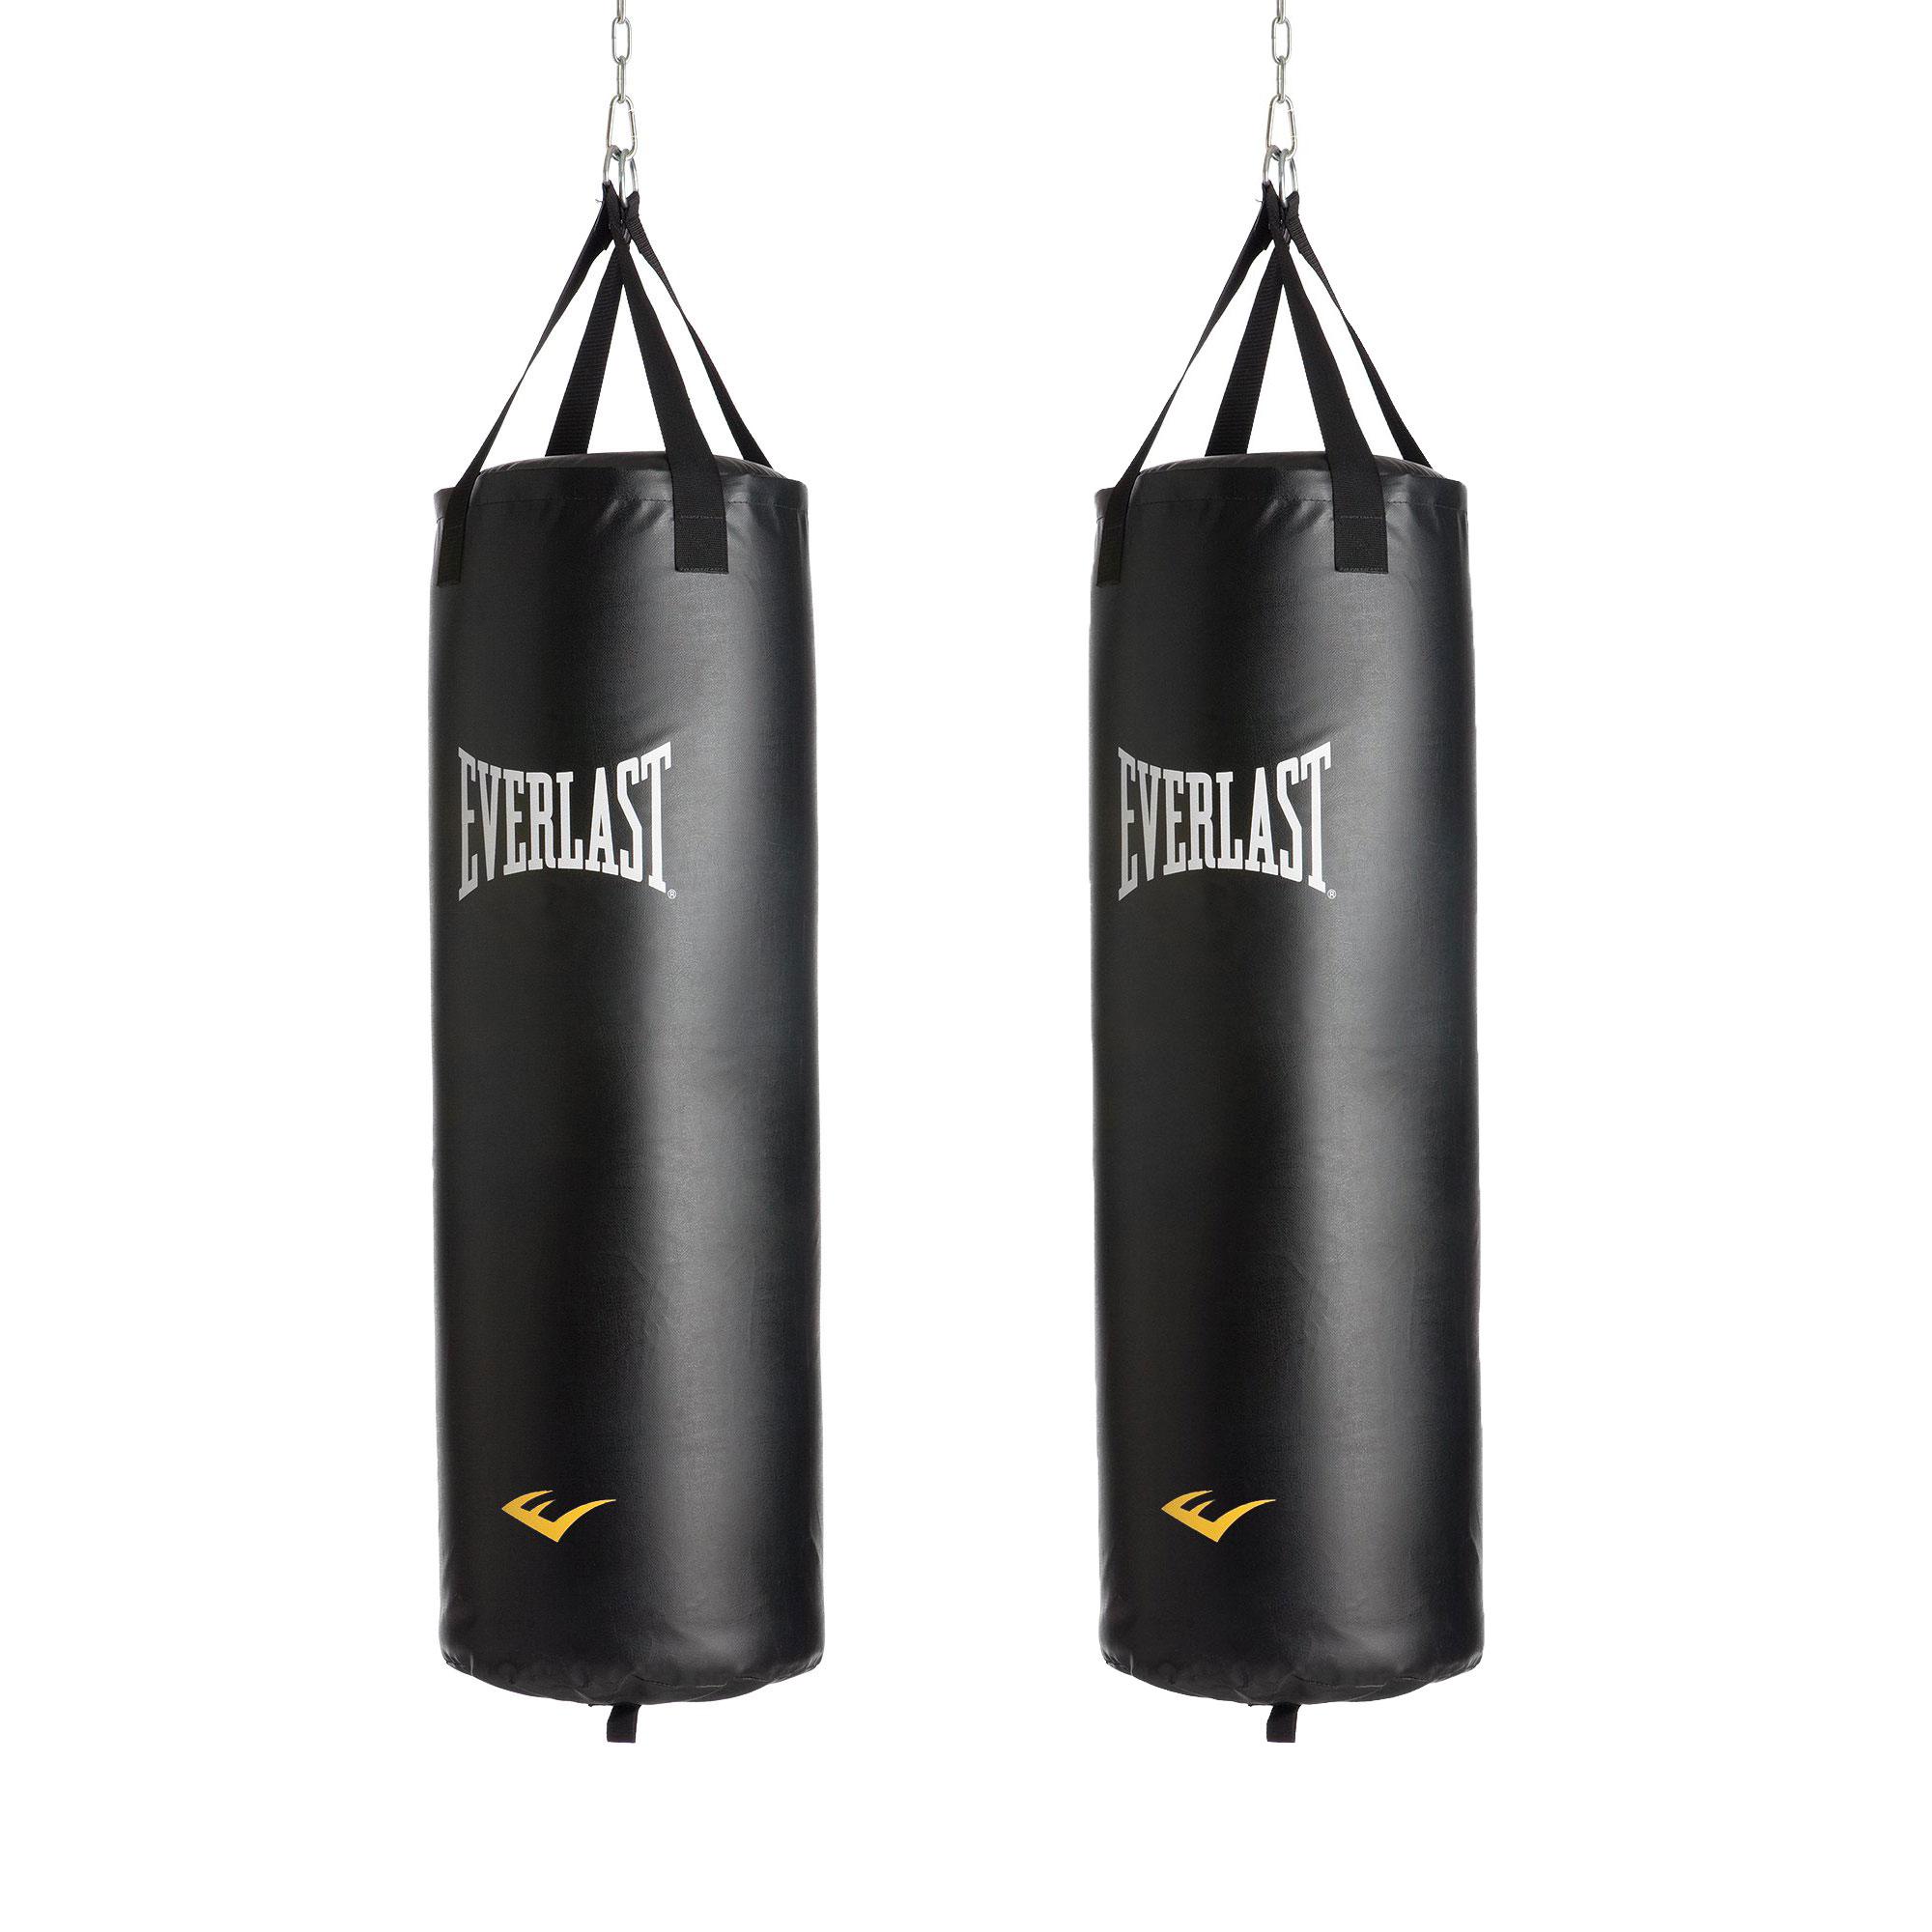 Everlast Nevatear 40 Lb Kick Boxing Punching Training Heavy Bag Black 2 Pack